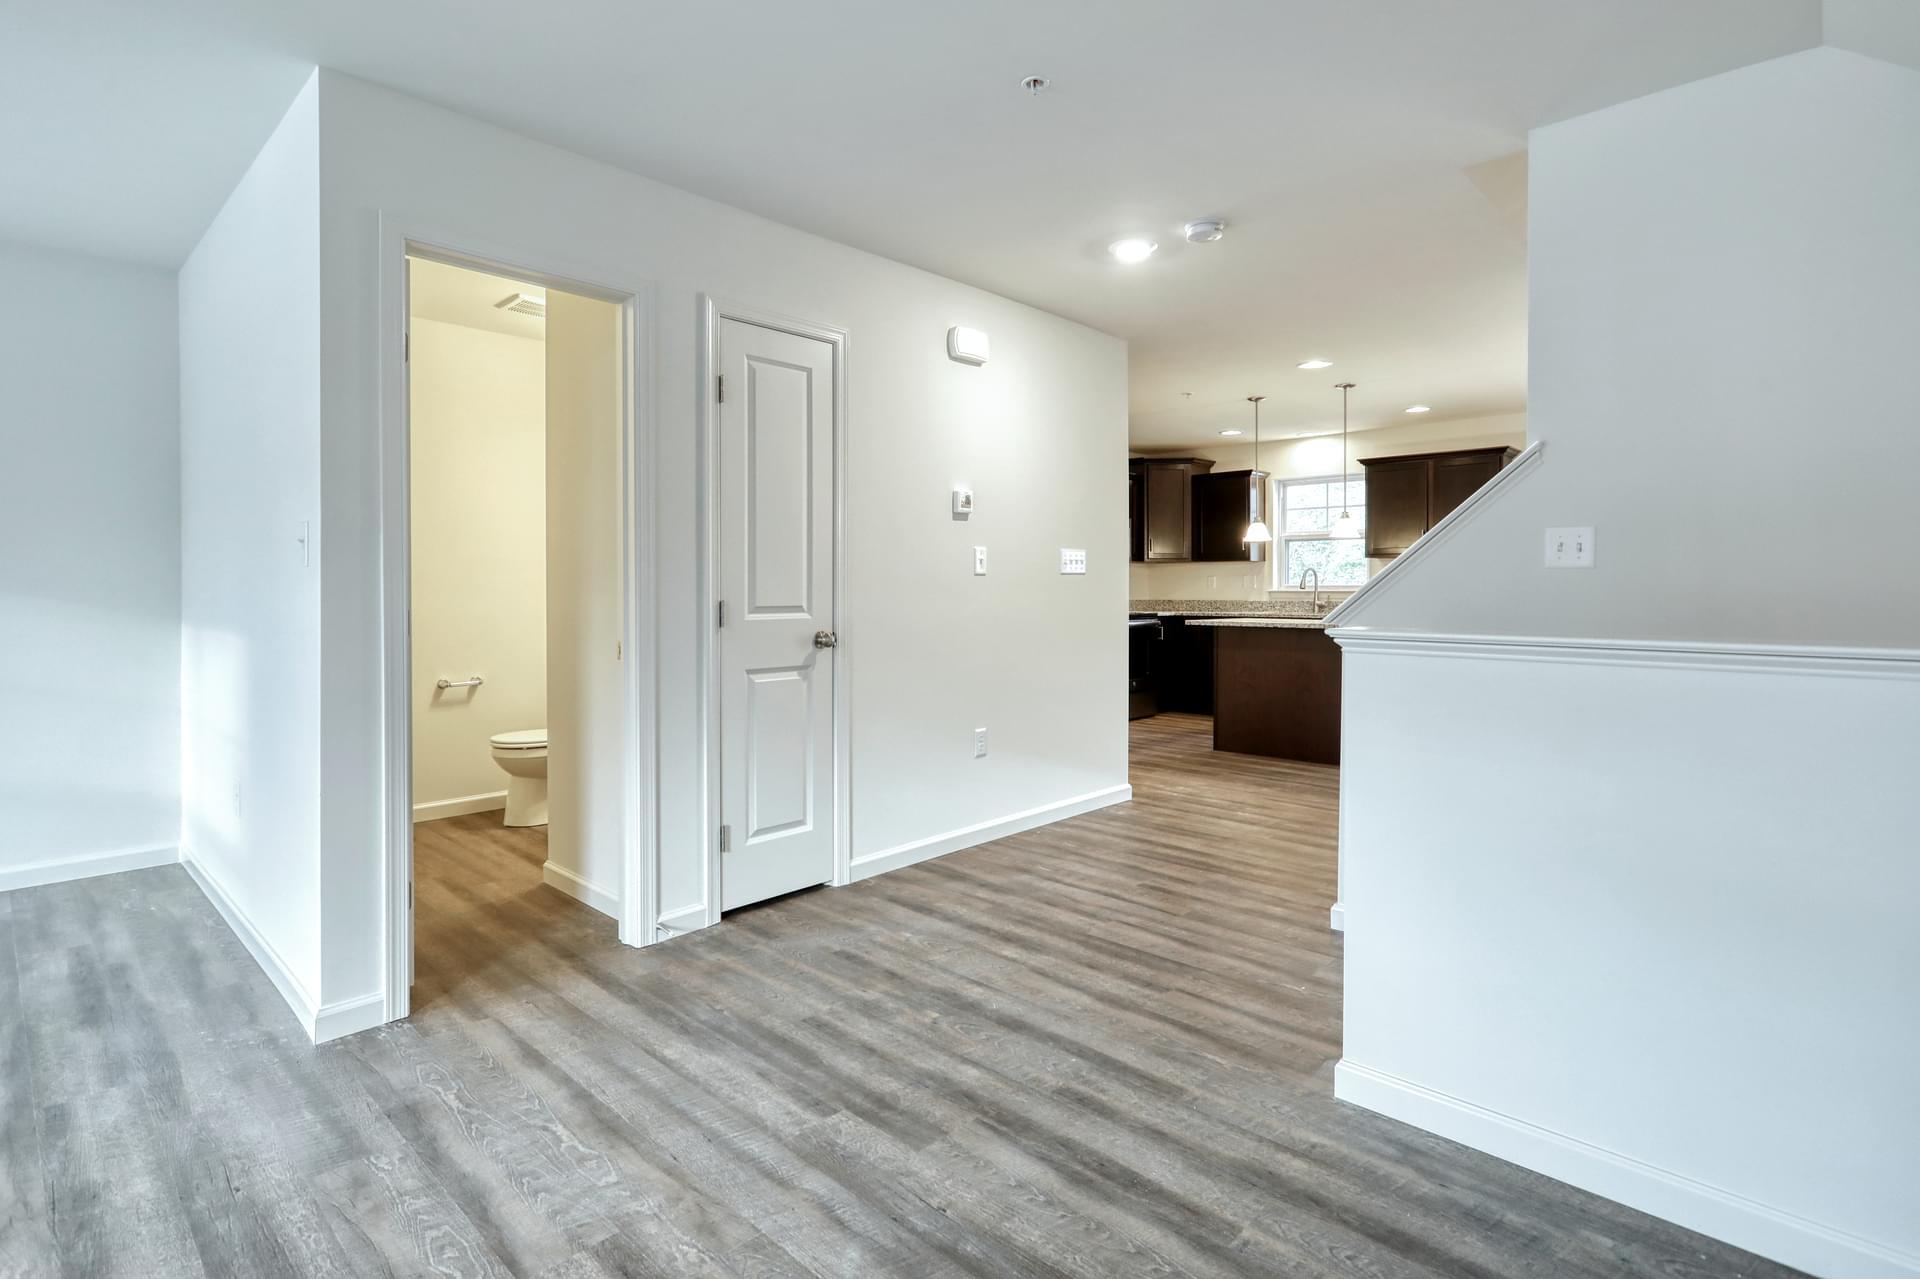 New Home in Stewartstown, PA